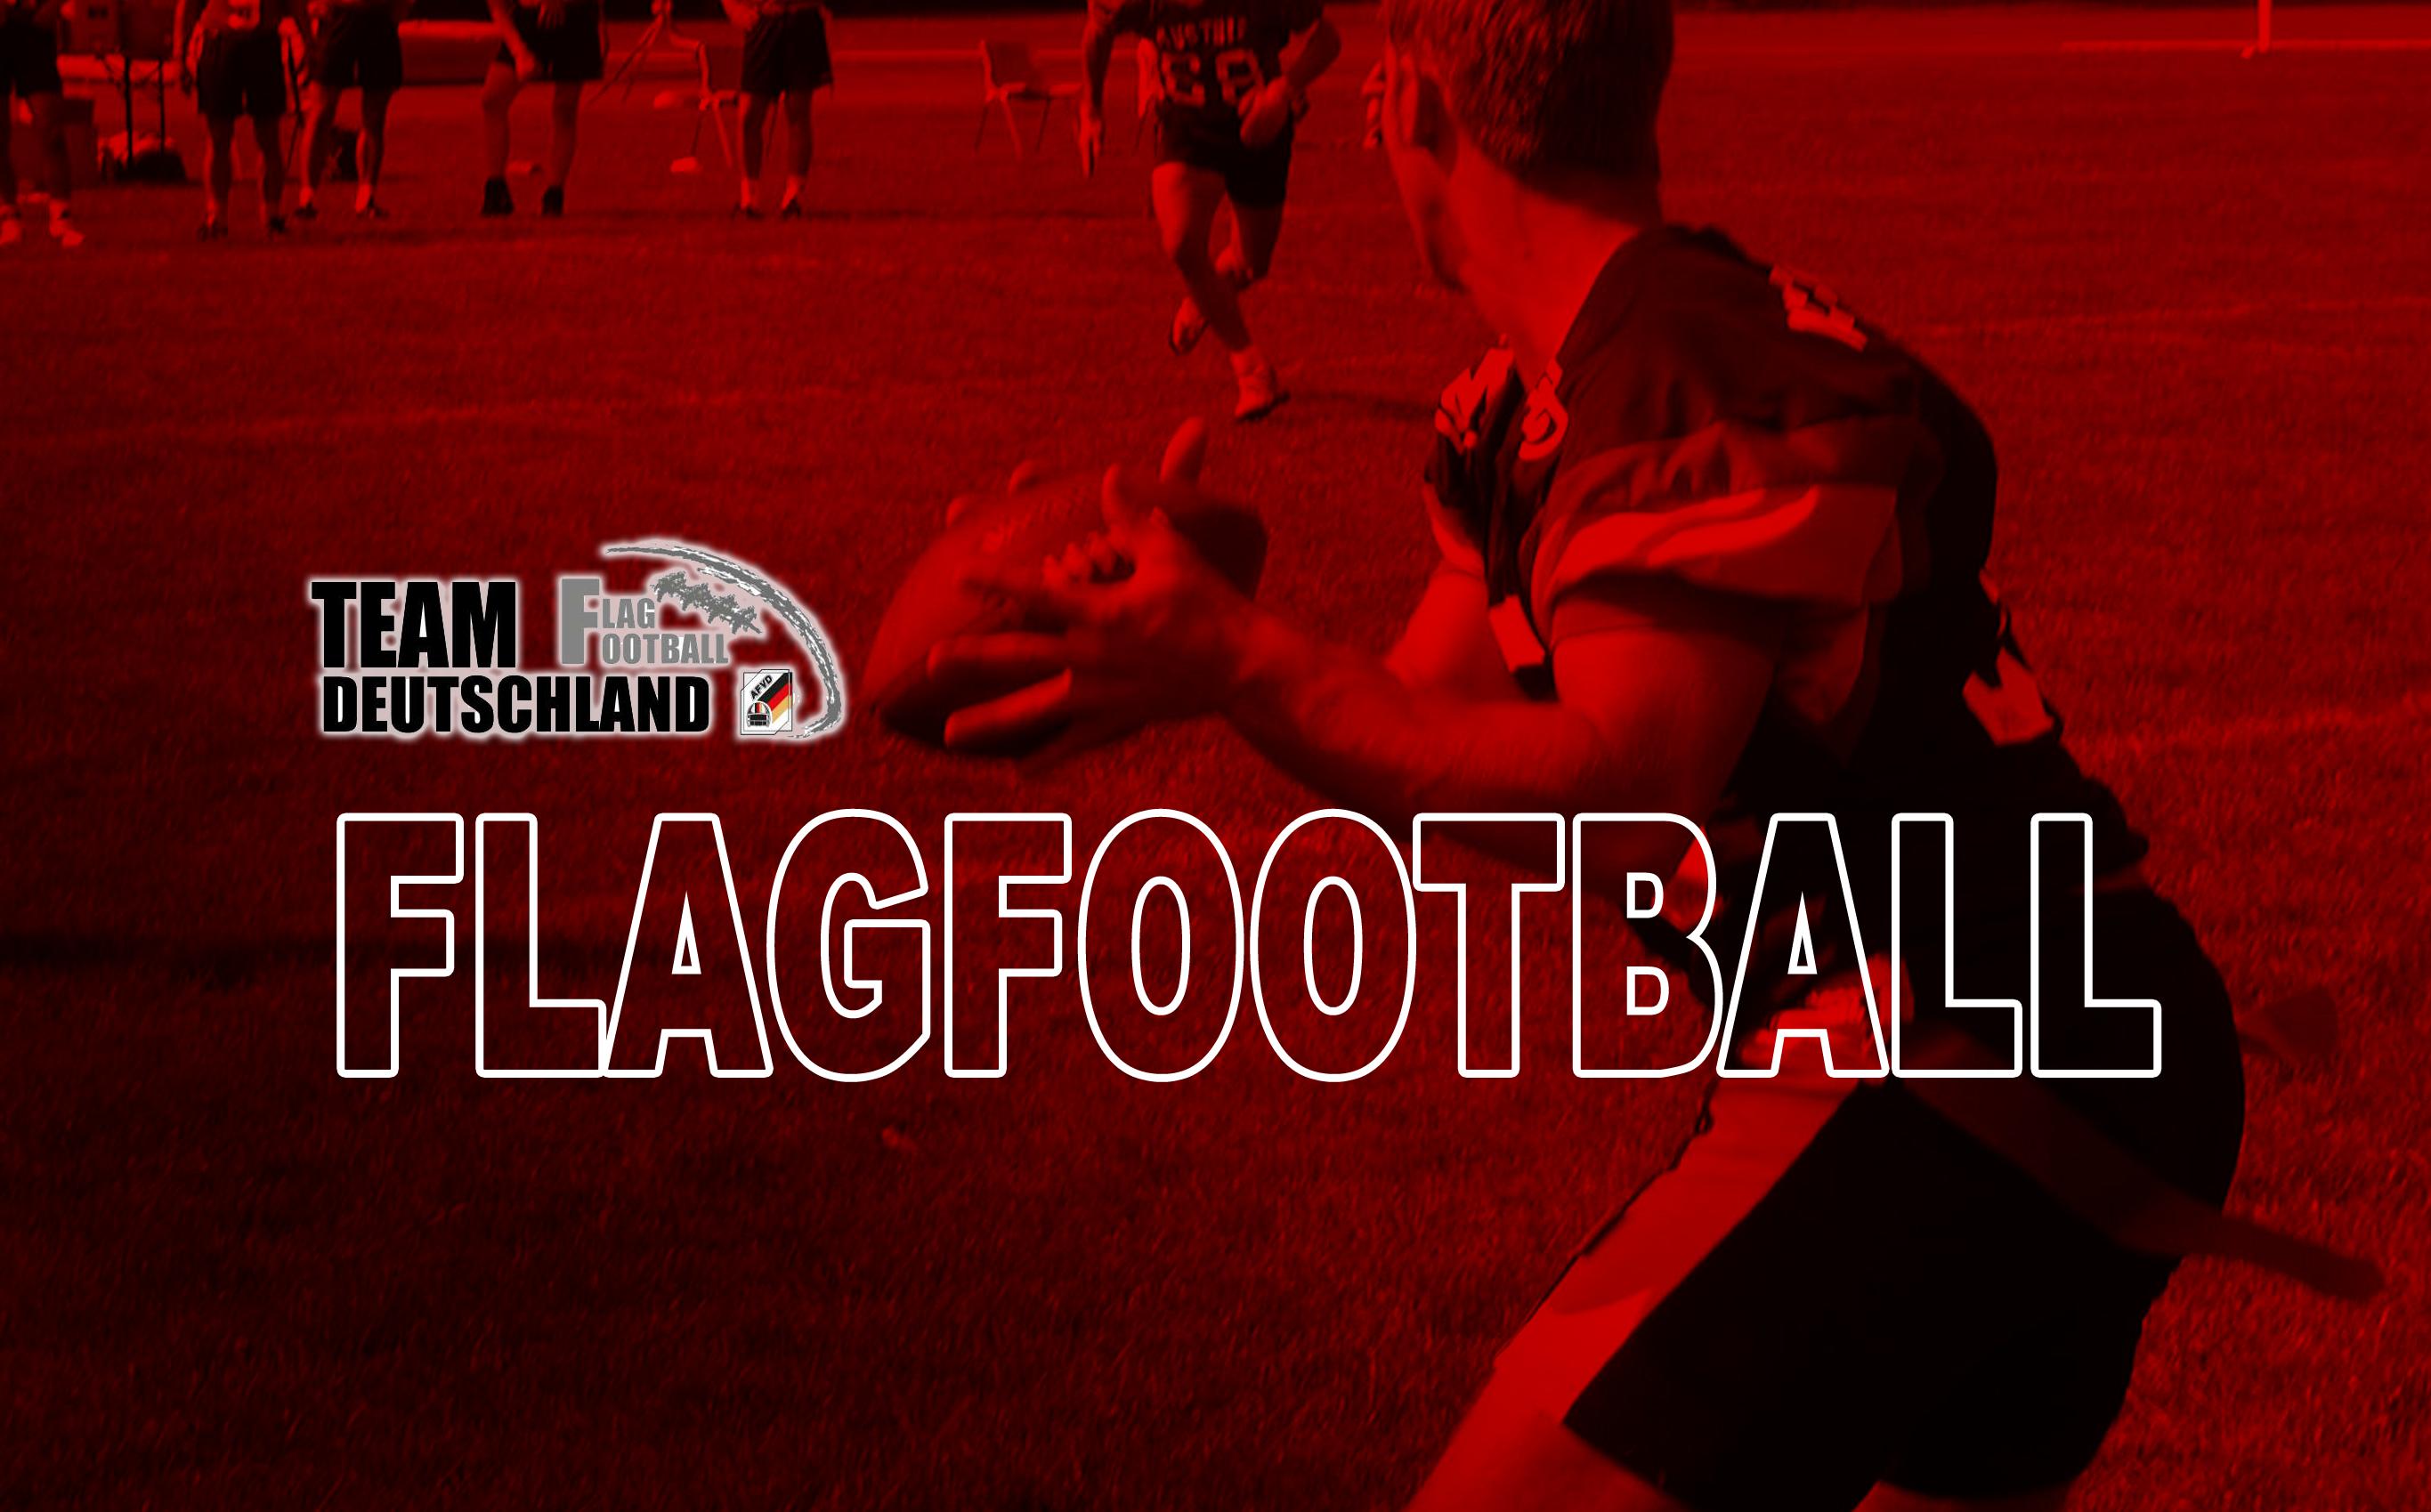 AFVD Team Deutschland Flagfootball